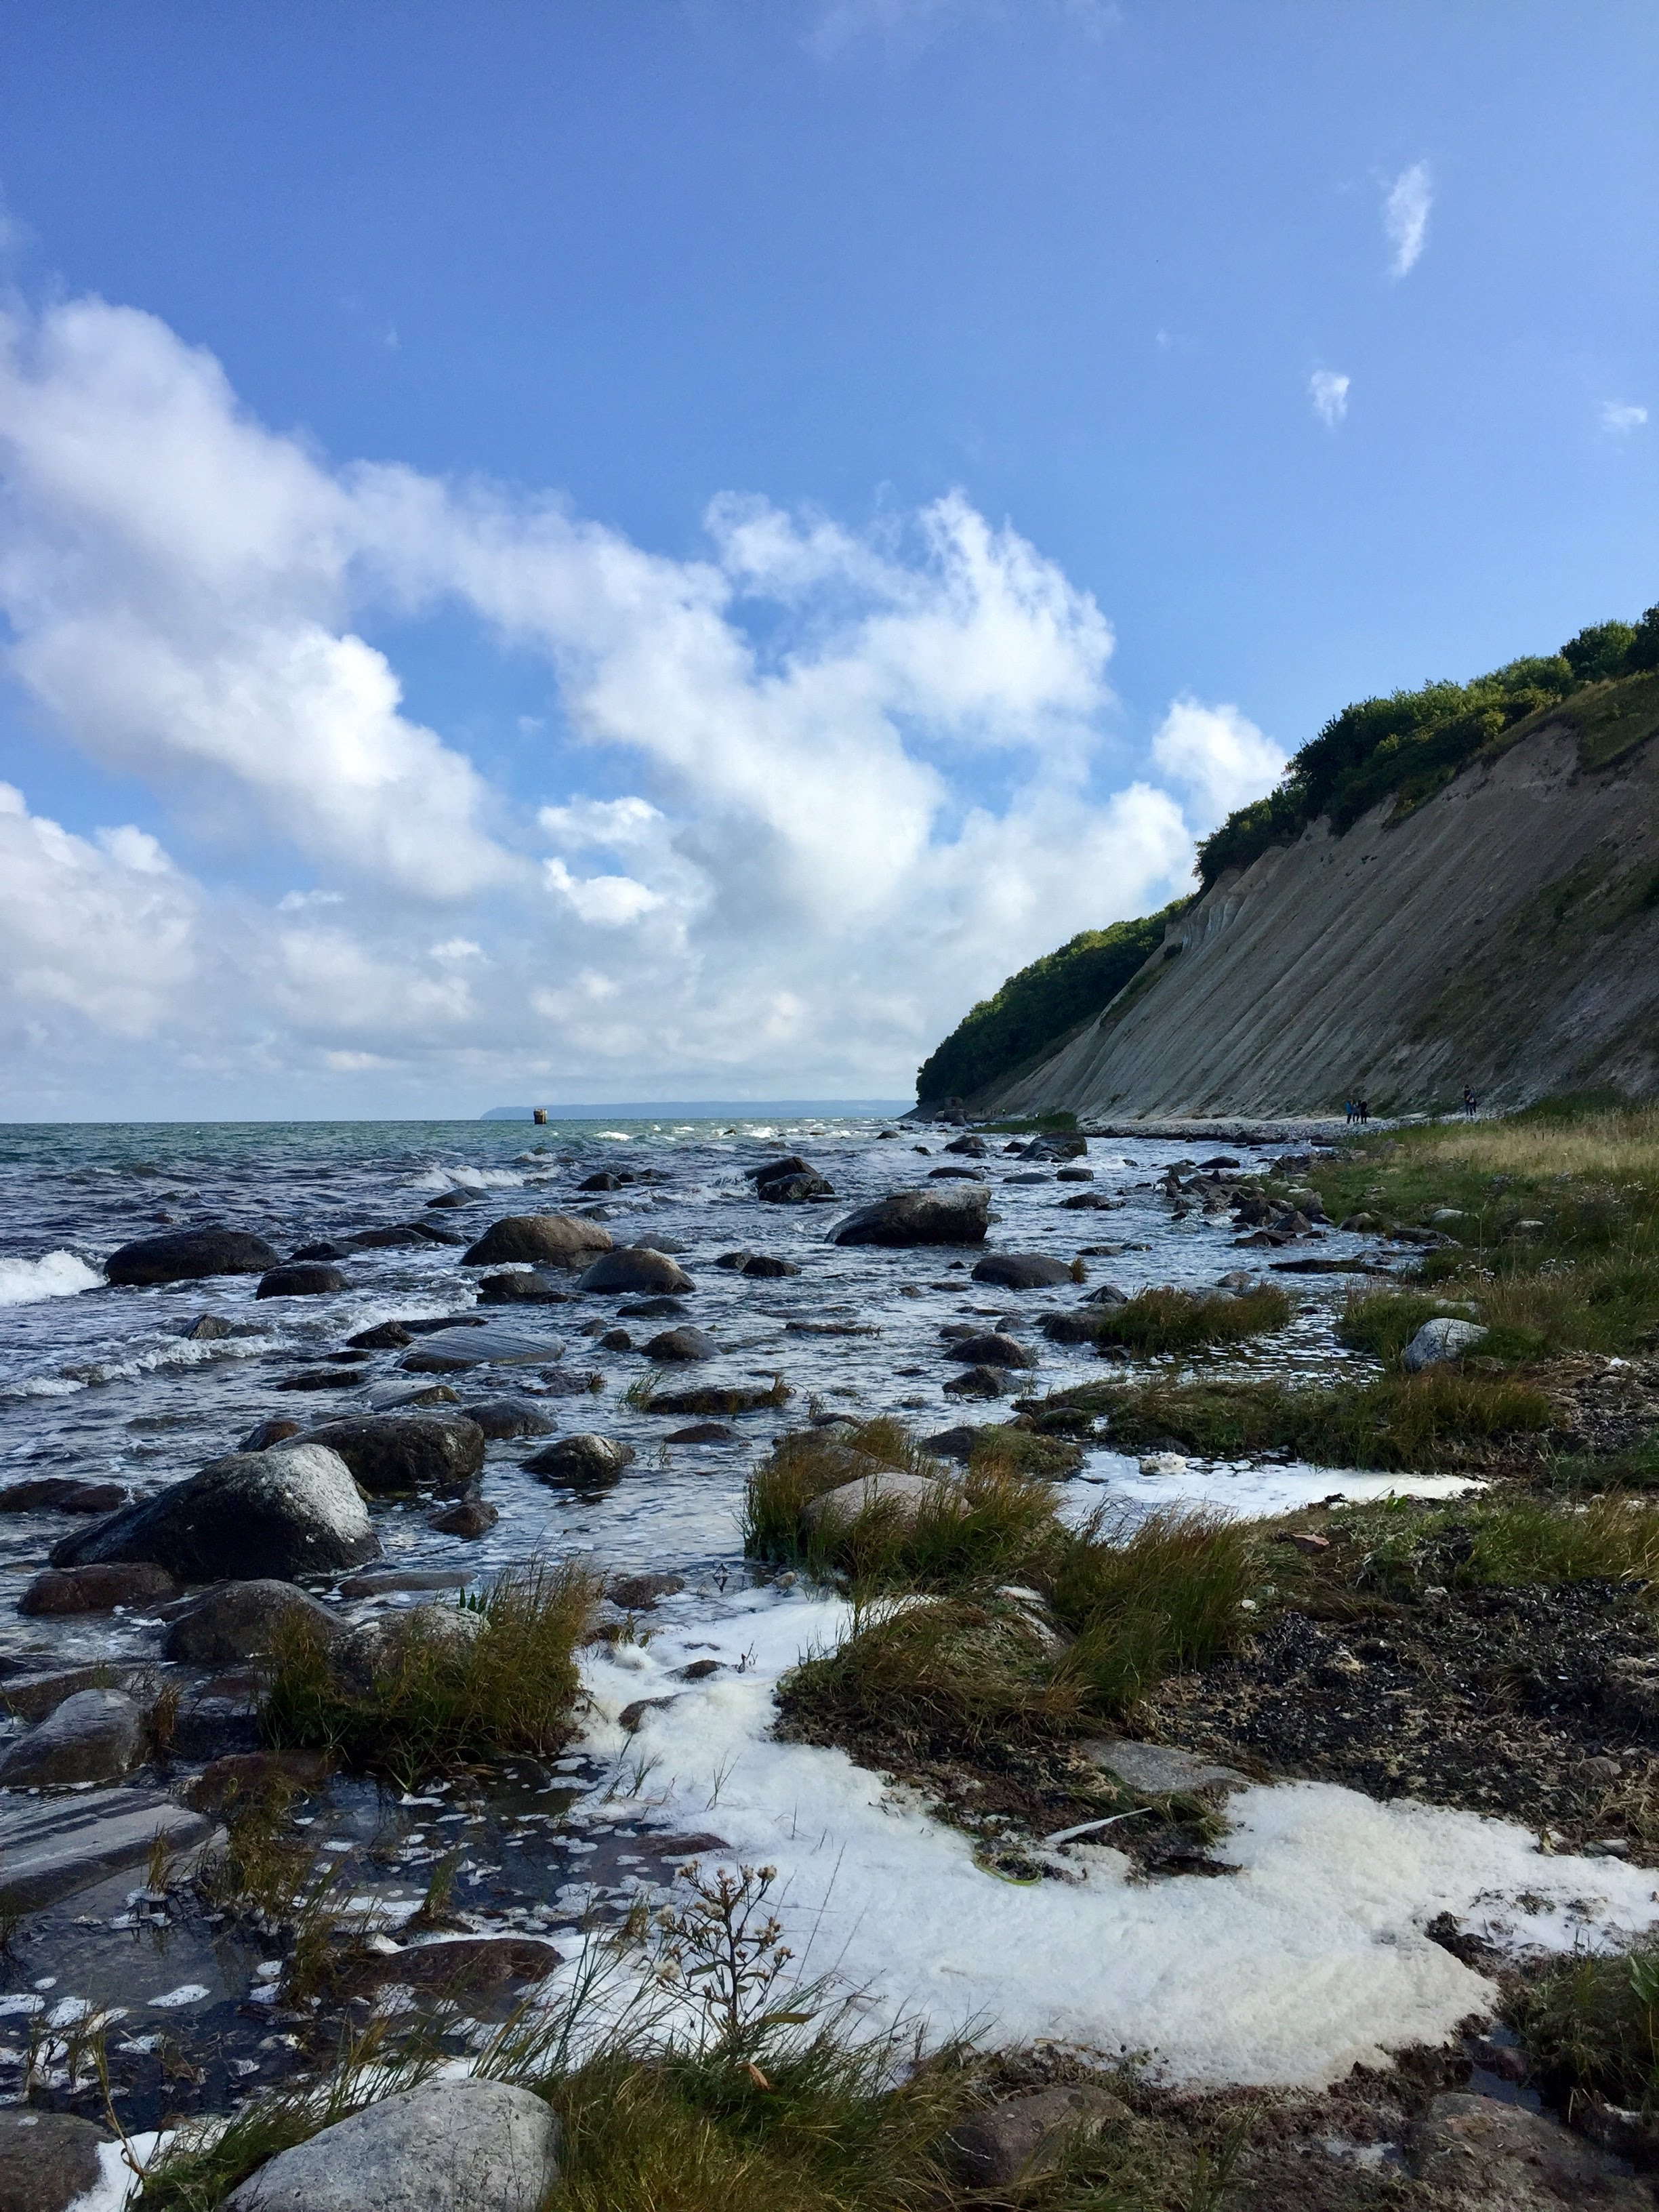 Wanderung zu den Kreidefelsen auf Rügen